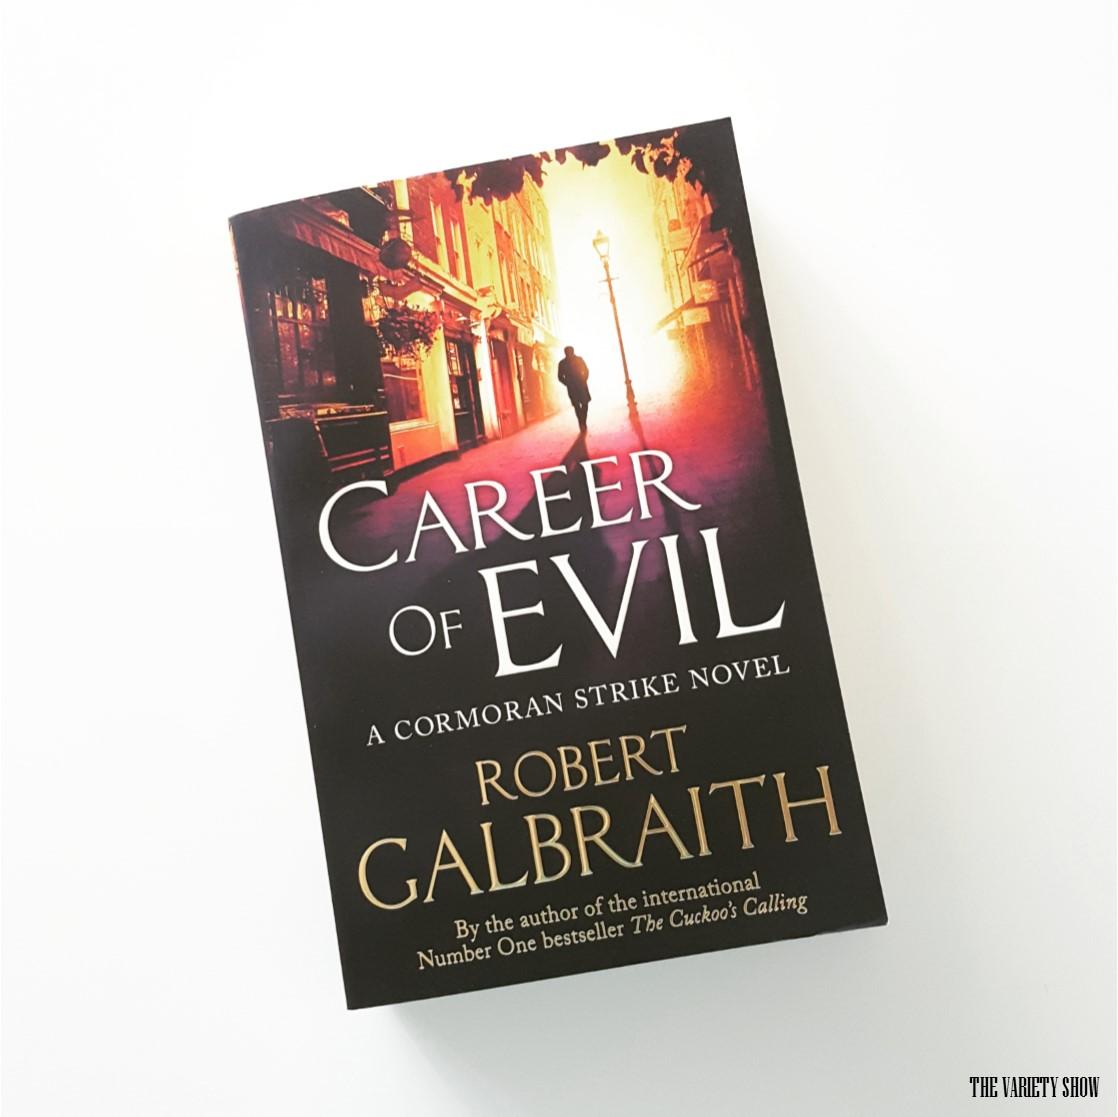 robert_galbraith_career_of_evil.jpg